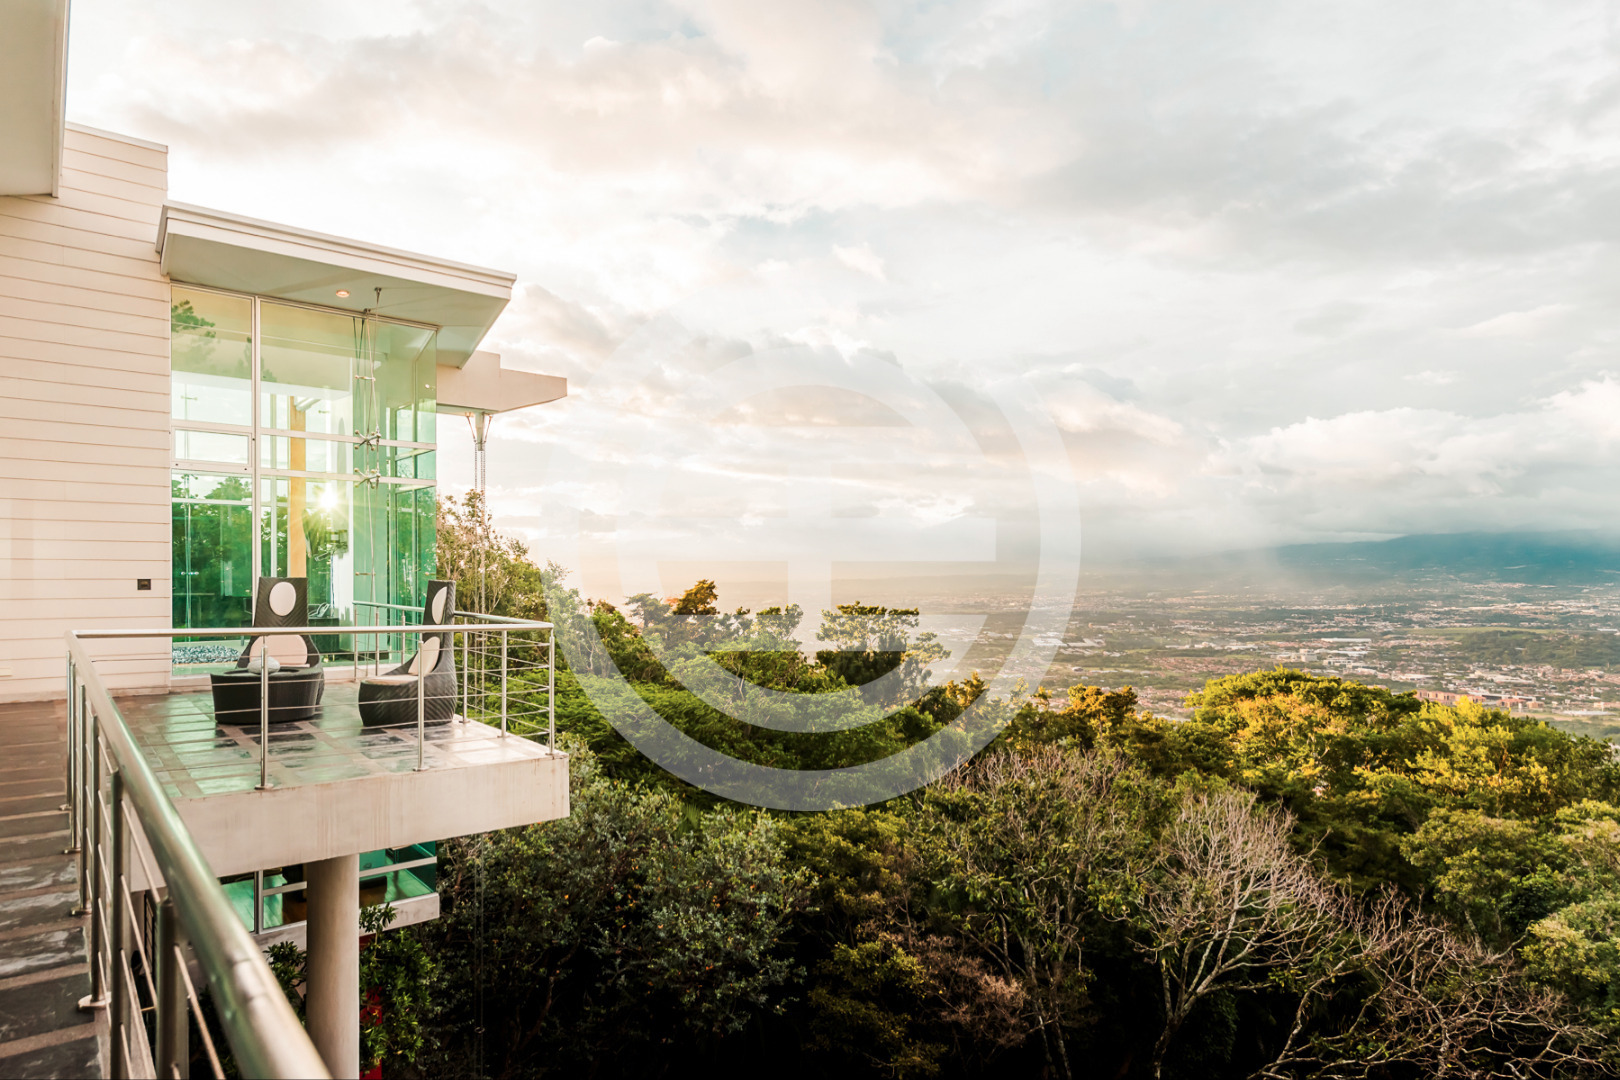 Parque Montana Del Sol提供与自然和谐相处的生活环境,以及让你过上特别优质生活的一切豪华设施